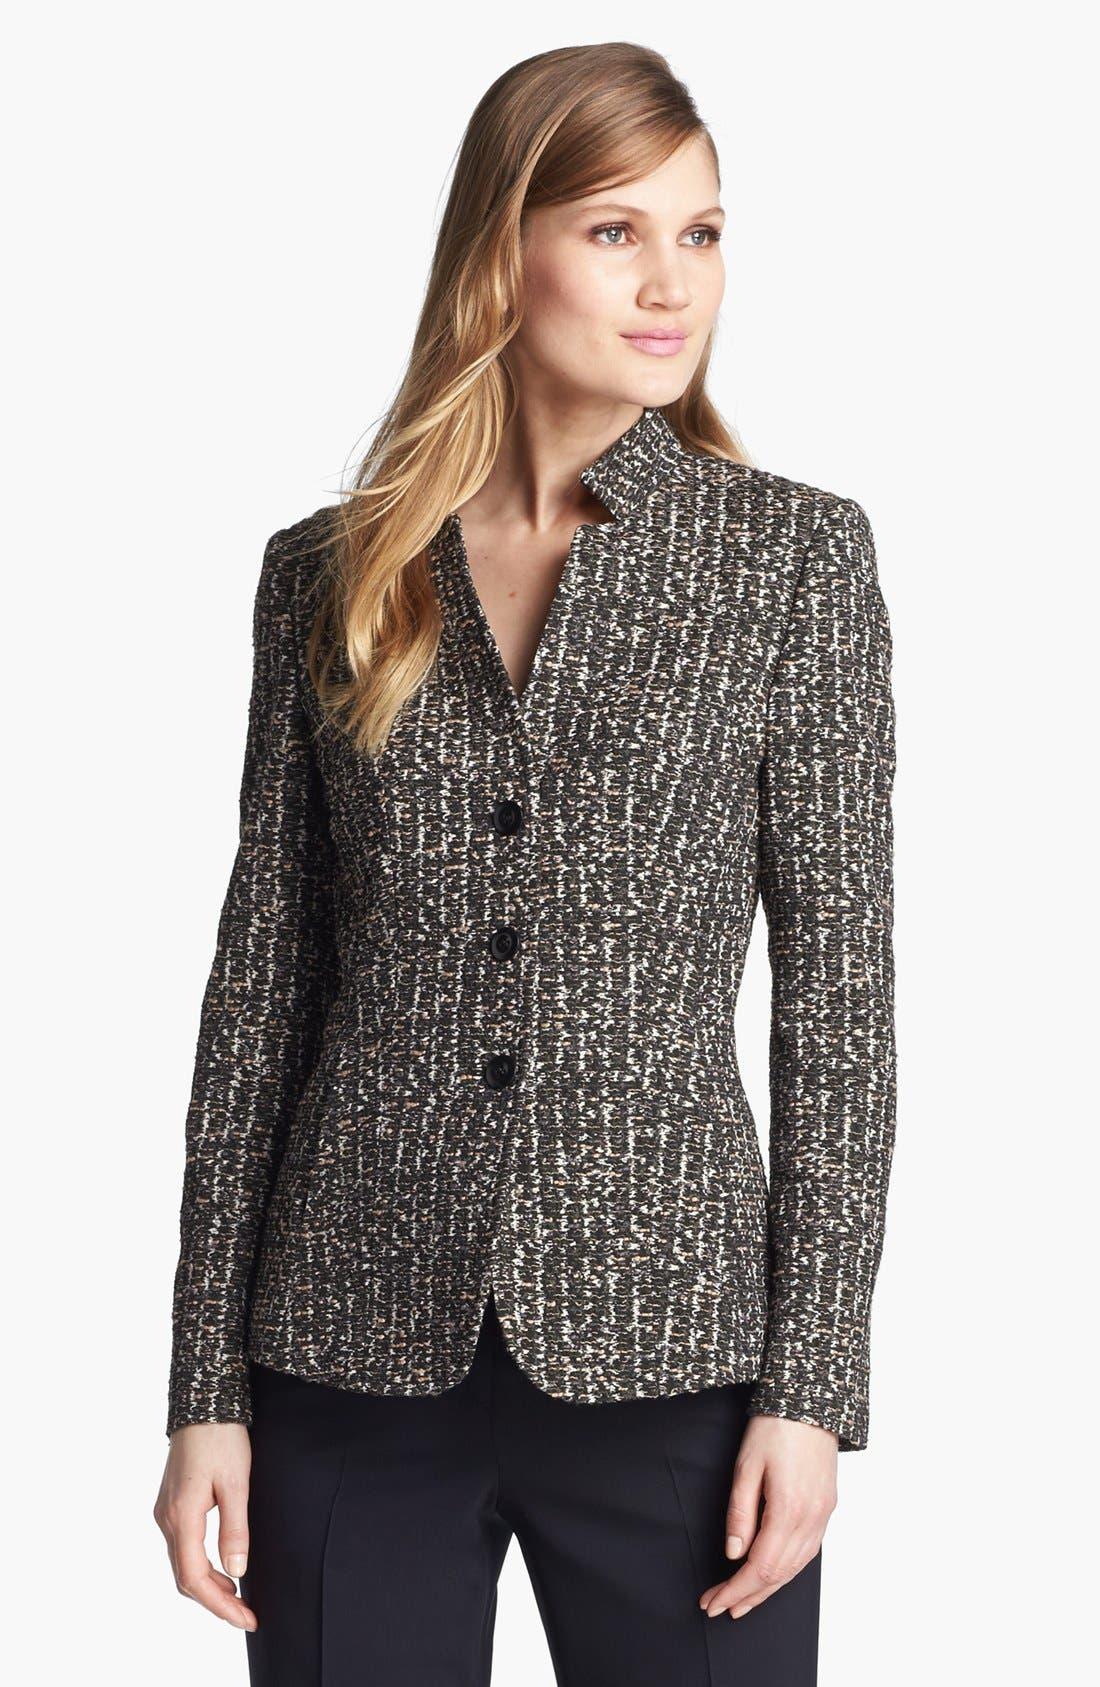 Alternate Image 1 Selected - Santorelli 'Dana' Jacket